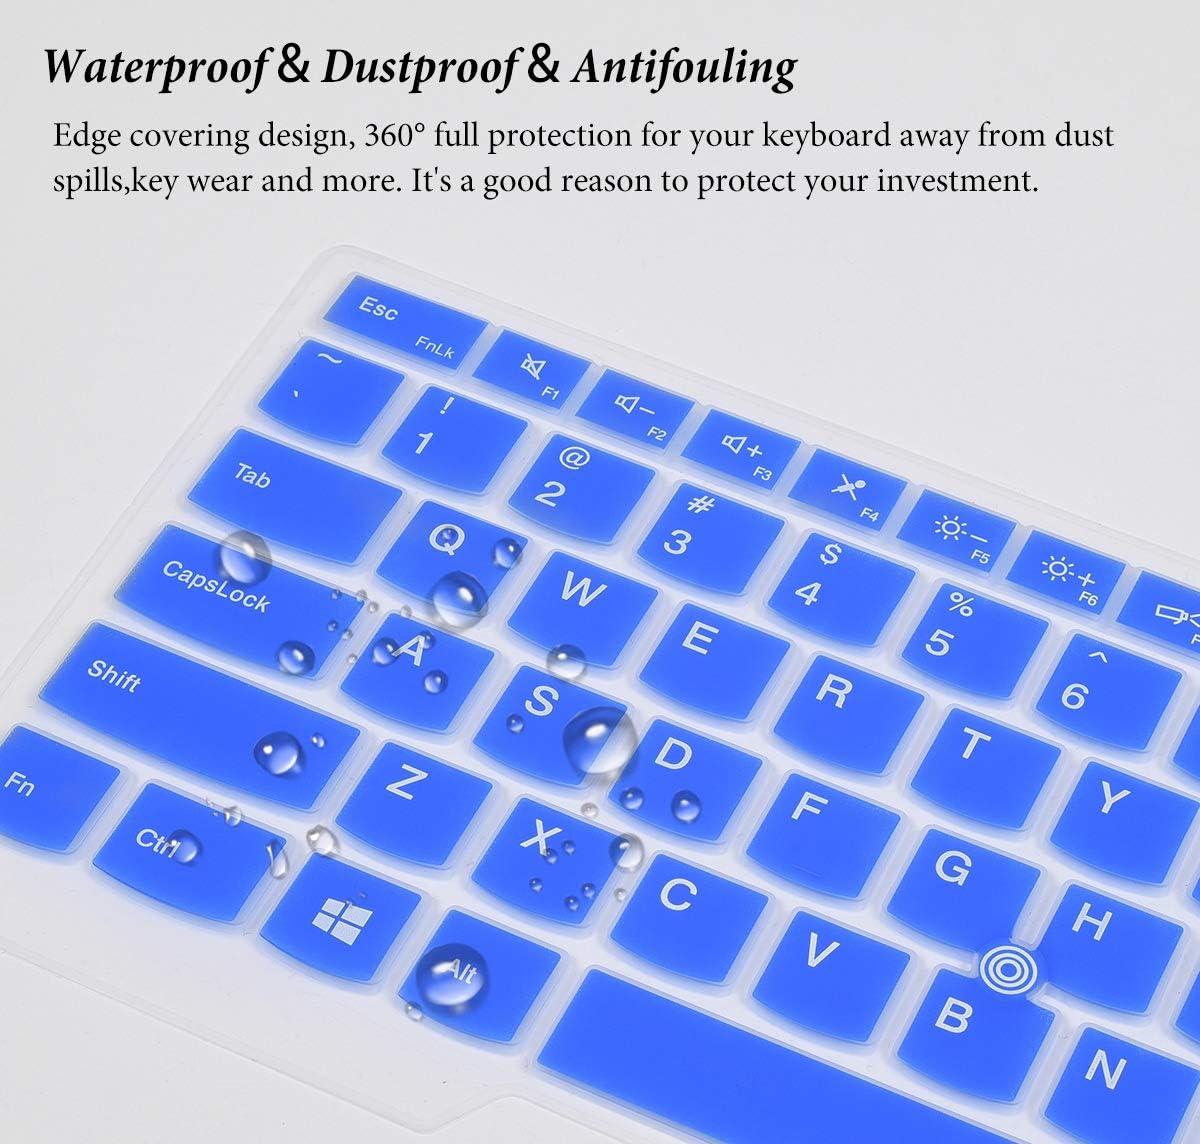 Blue Keyboard Cover Skin for 2019 2018 2017 Lenovo Thinkpad X1 Carbon 5th//6th//7th//ThinkPad X1 Yoga 2nd//3rd//4th 2019 2018 2017//Thinkpad A475 L460 L470 T460 T460p T460s T470 T470p T470s T480 T480S